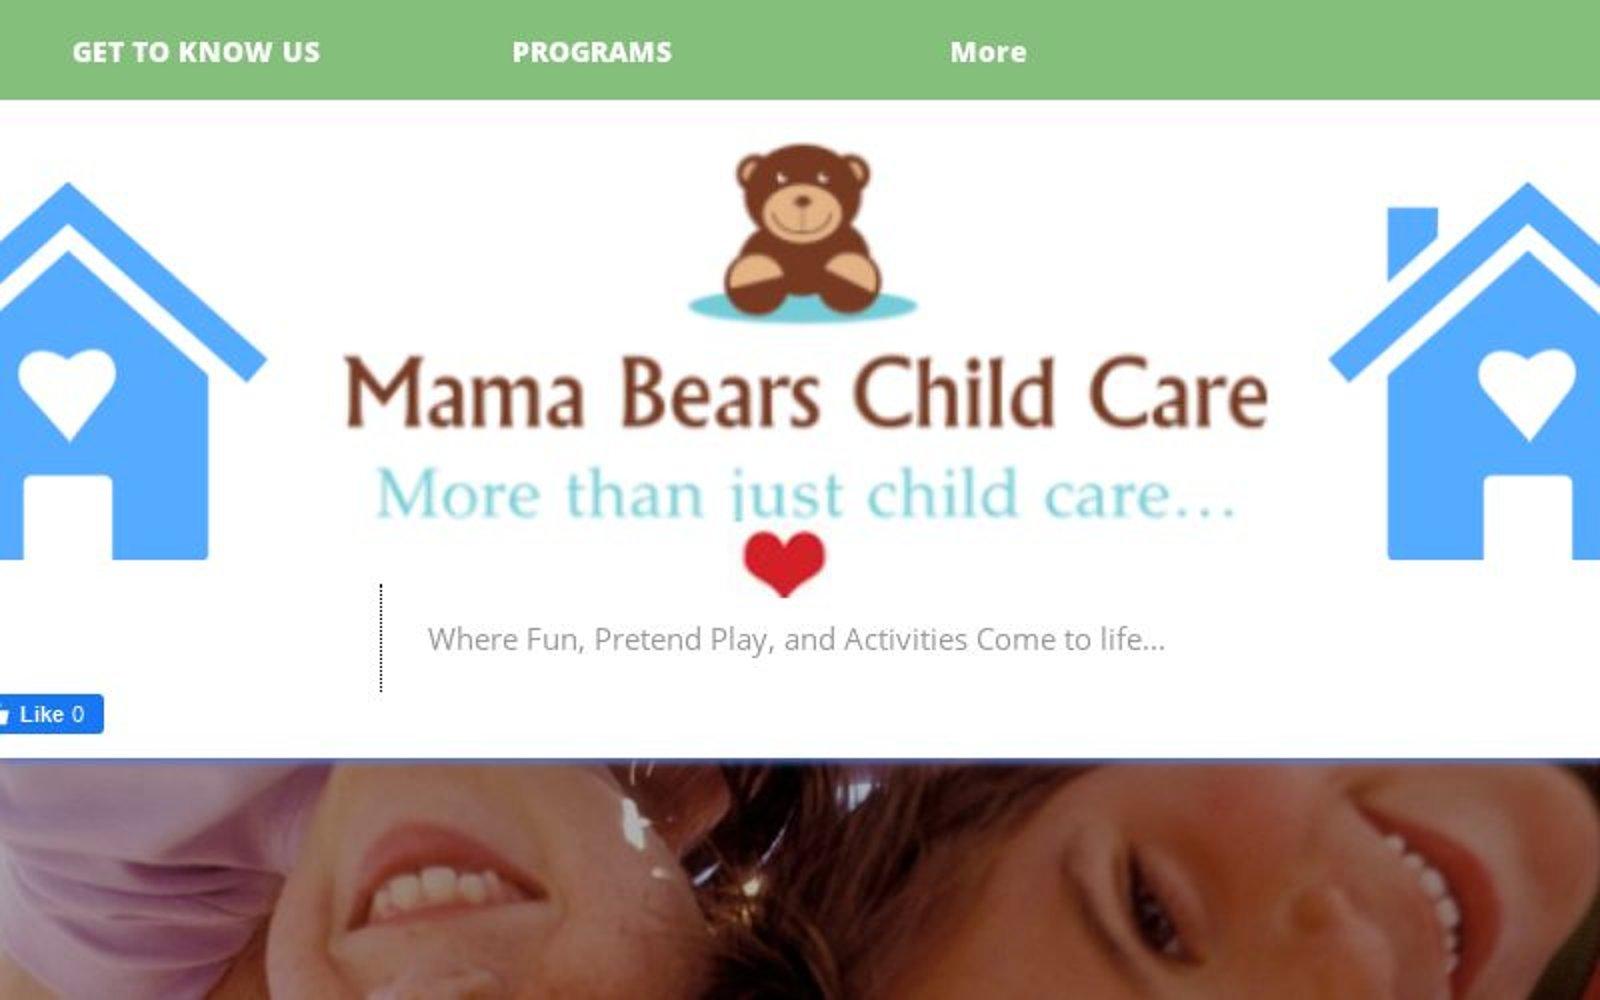 mamabearschildcarecenter